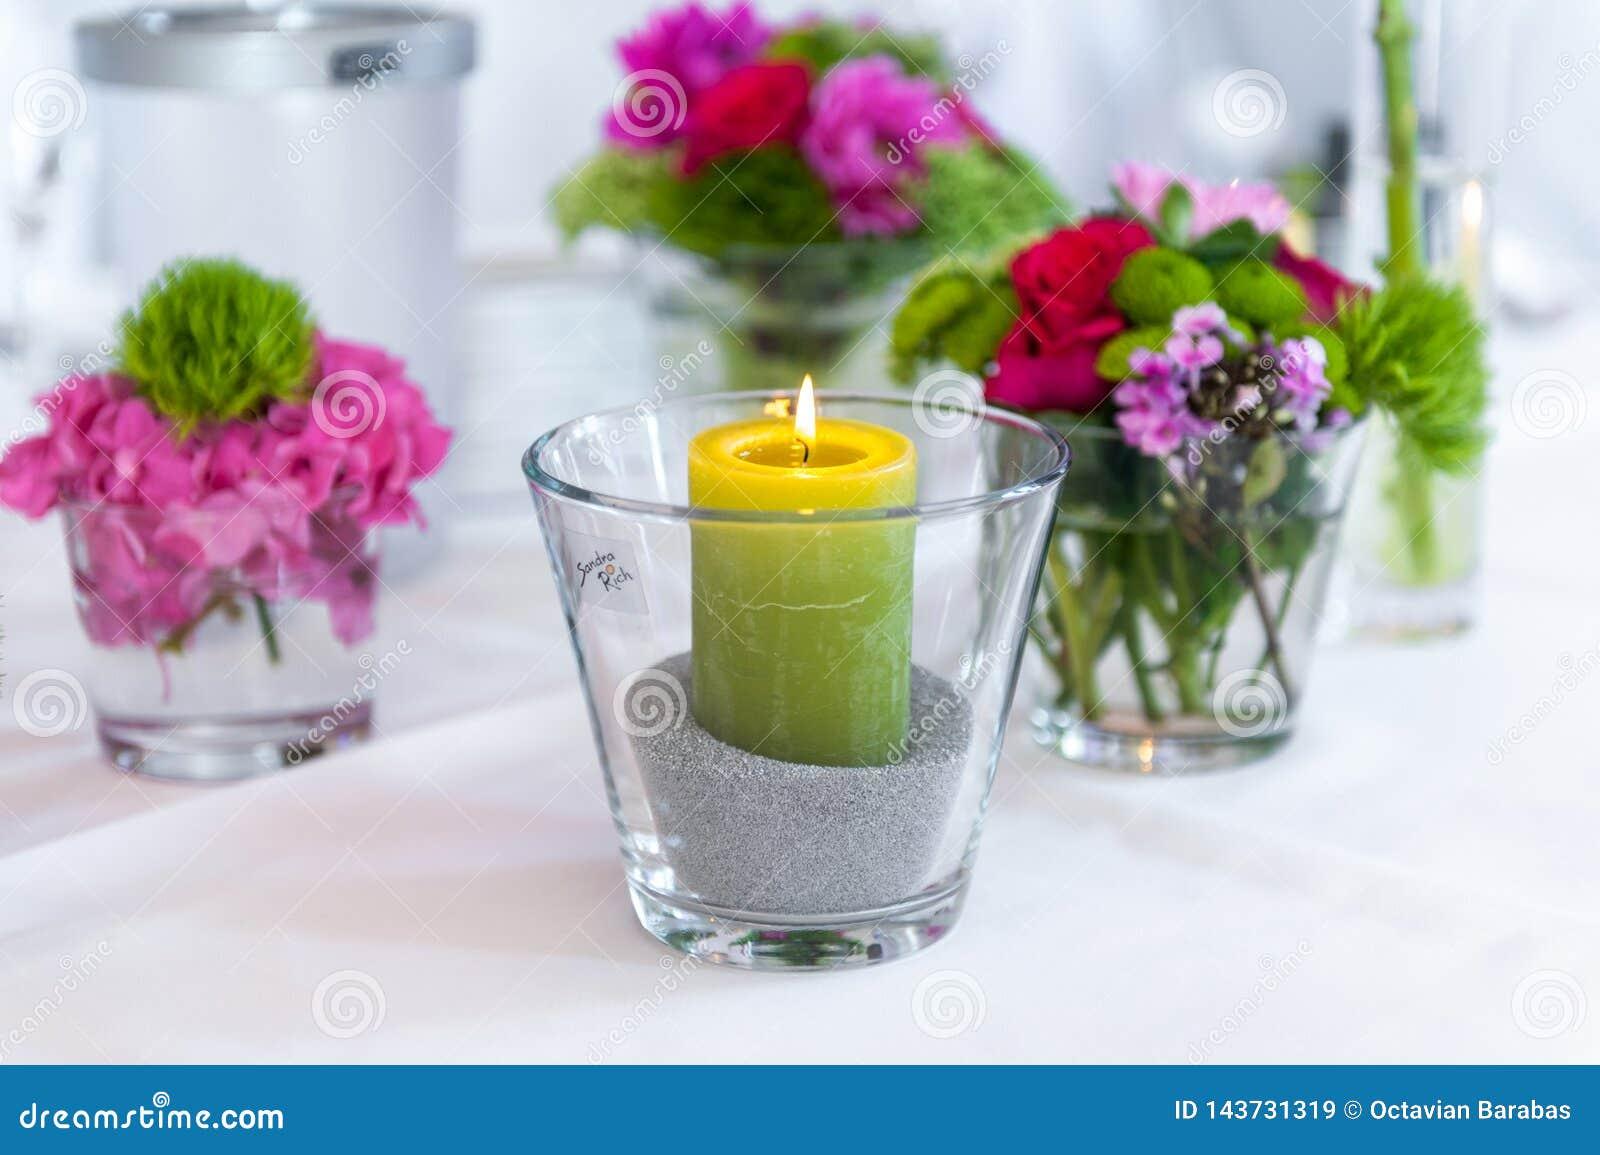 Bougie en verre sur la table blanche